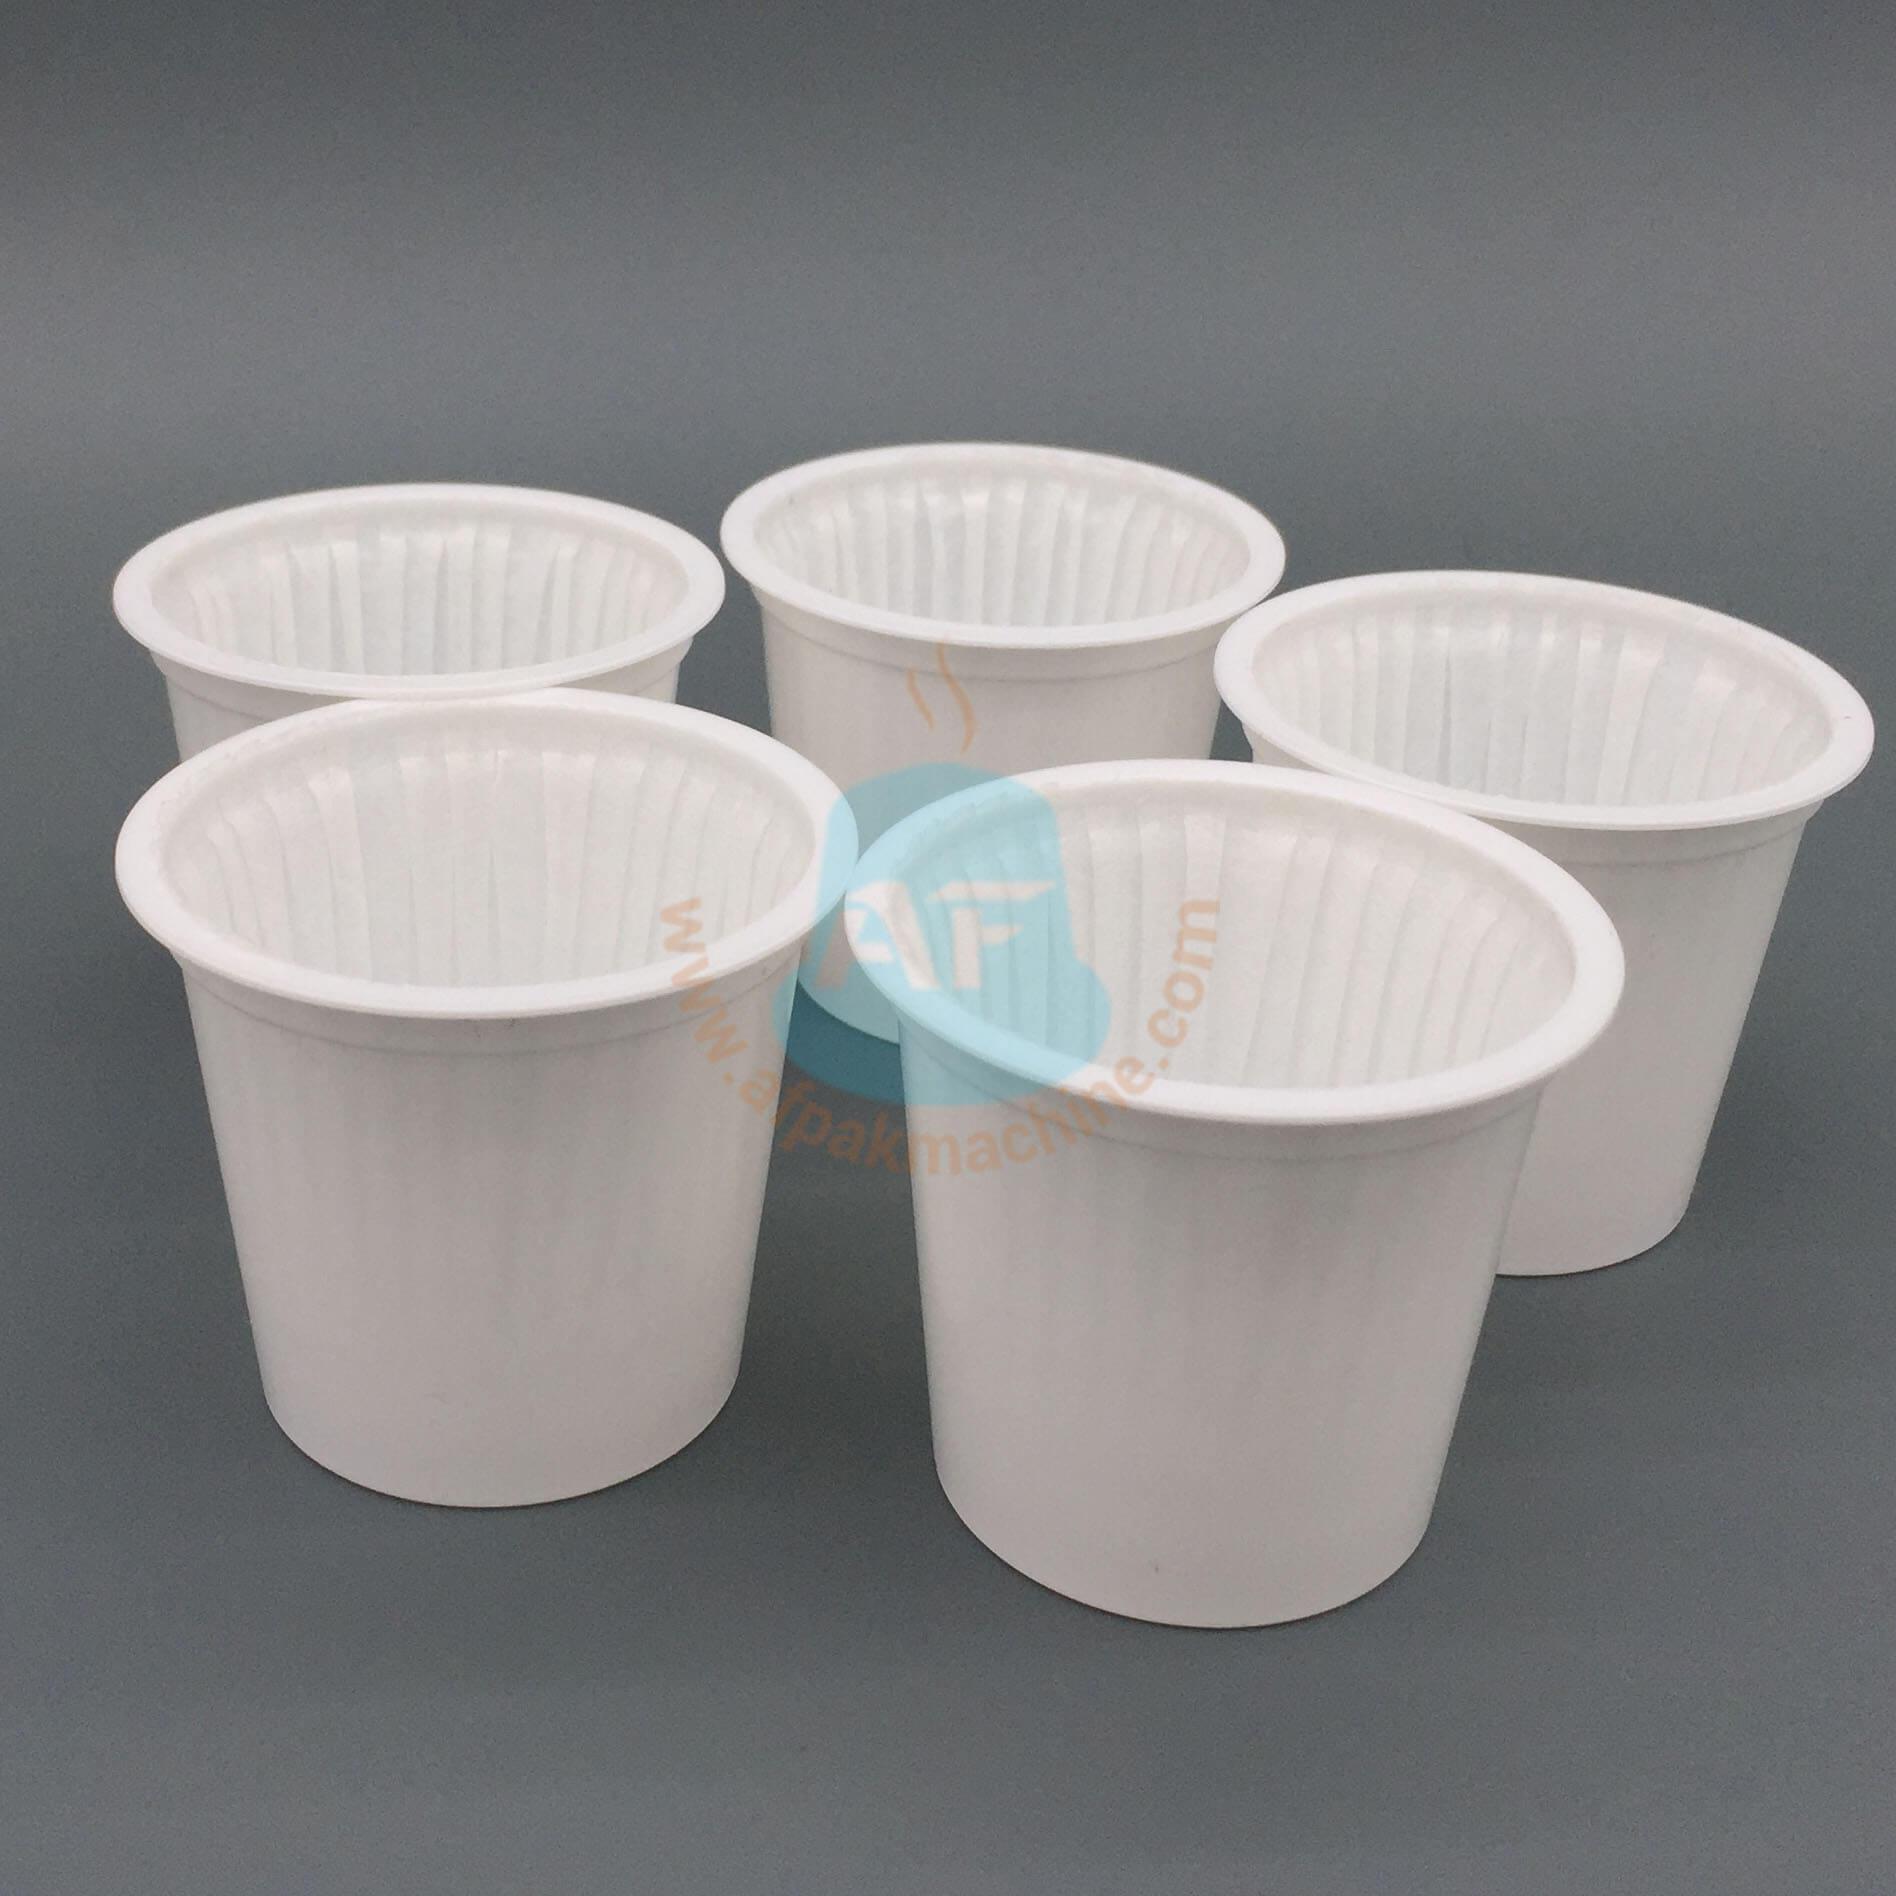 welded empty k cups